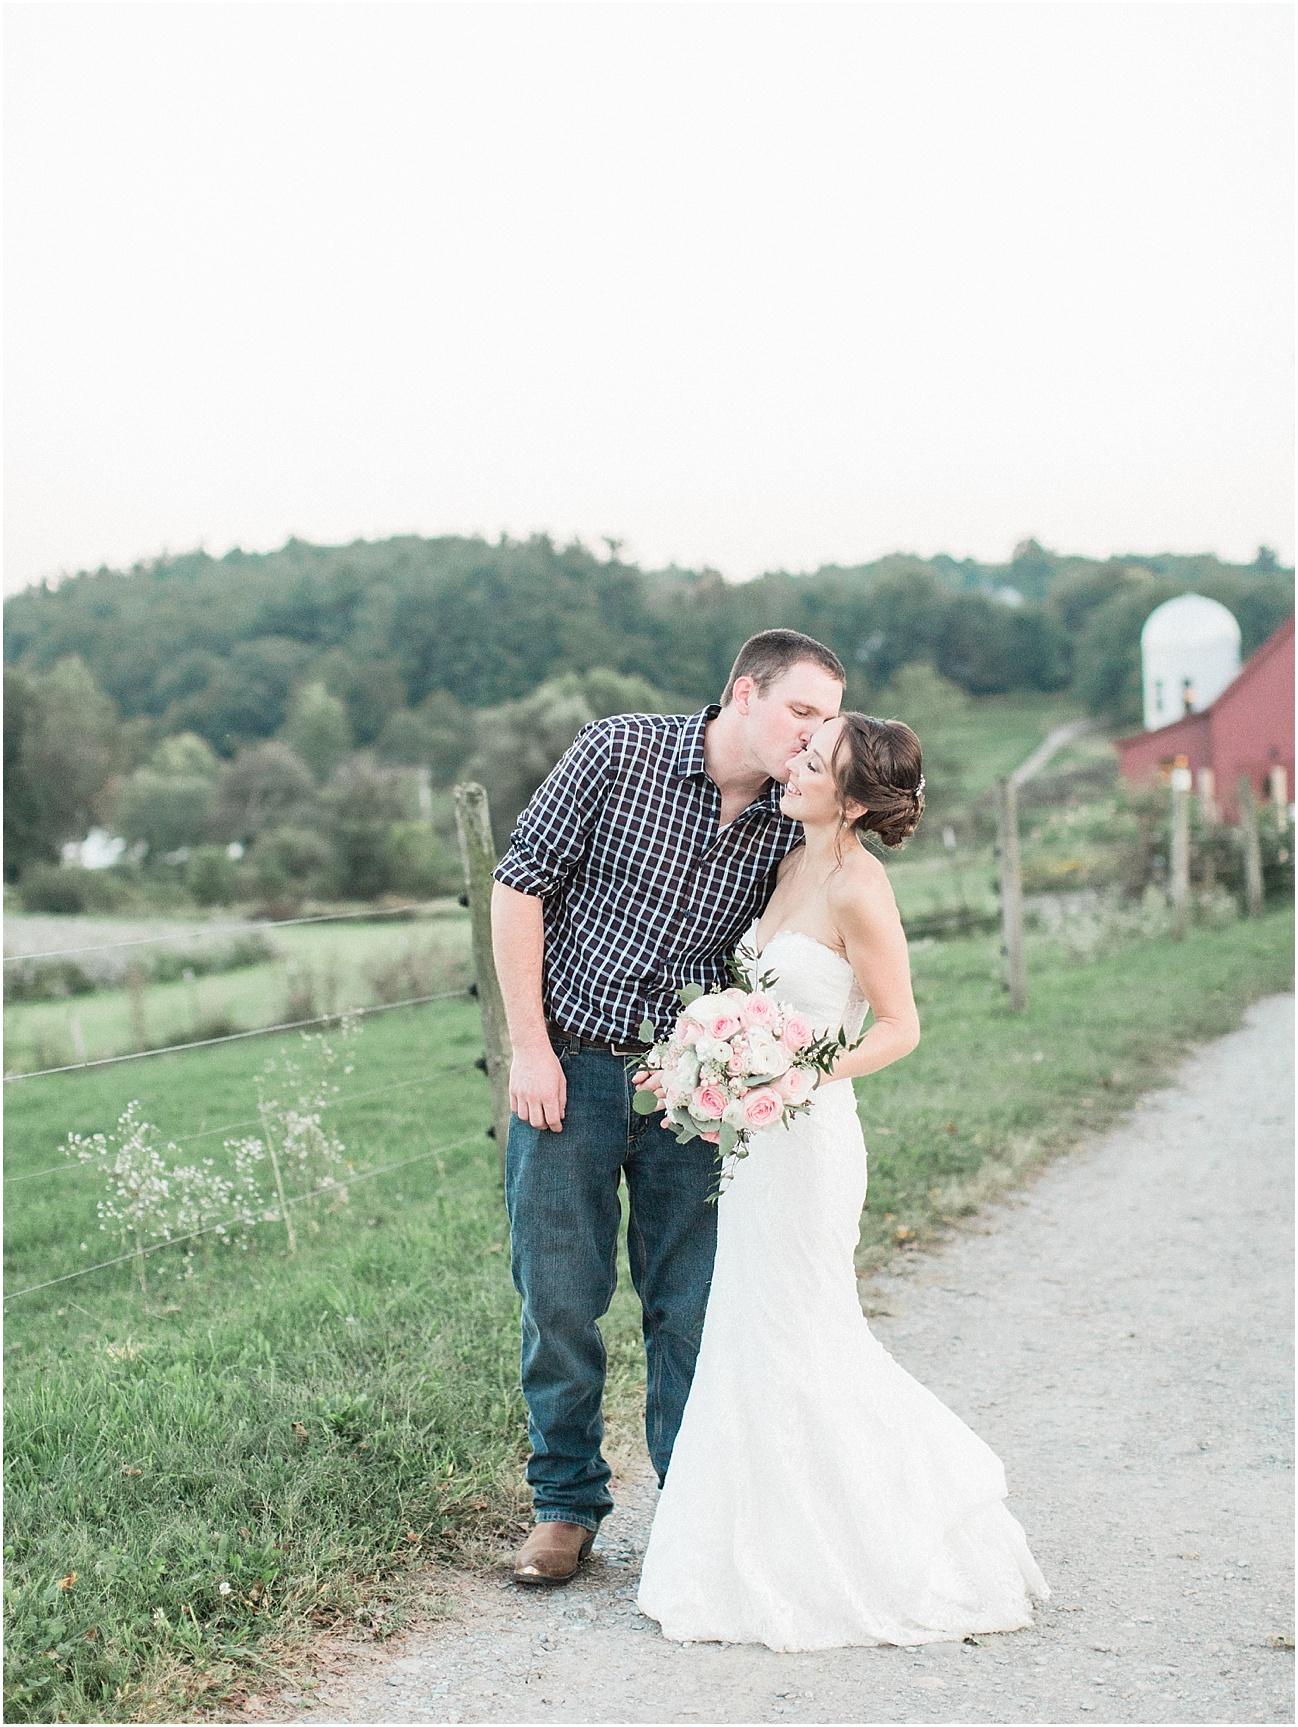 jackie_brad_barn_at_gibbett_hill_country_yellow_lab_fall_burgundy_cape_cod_boston_wedding_photographer_meredith_jane_photography_photo_1058.jpg